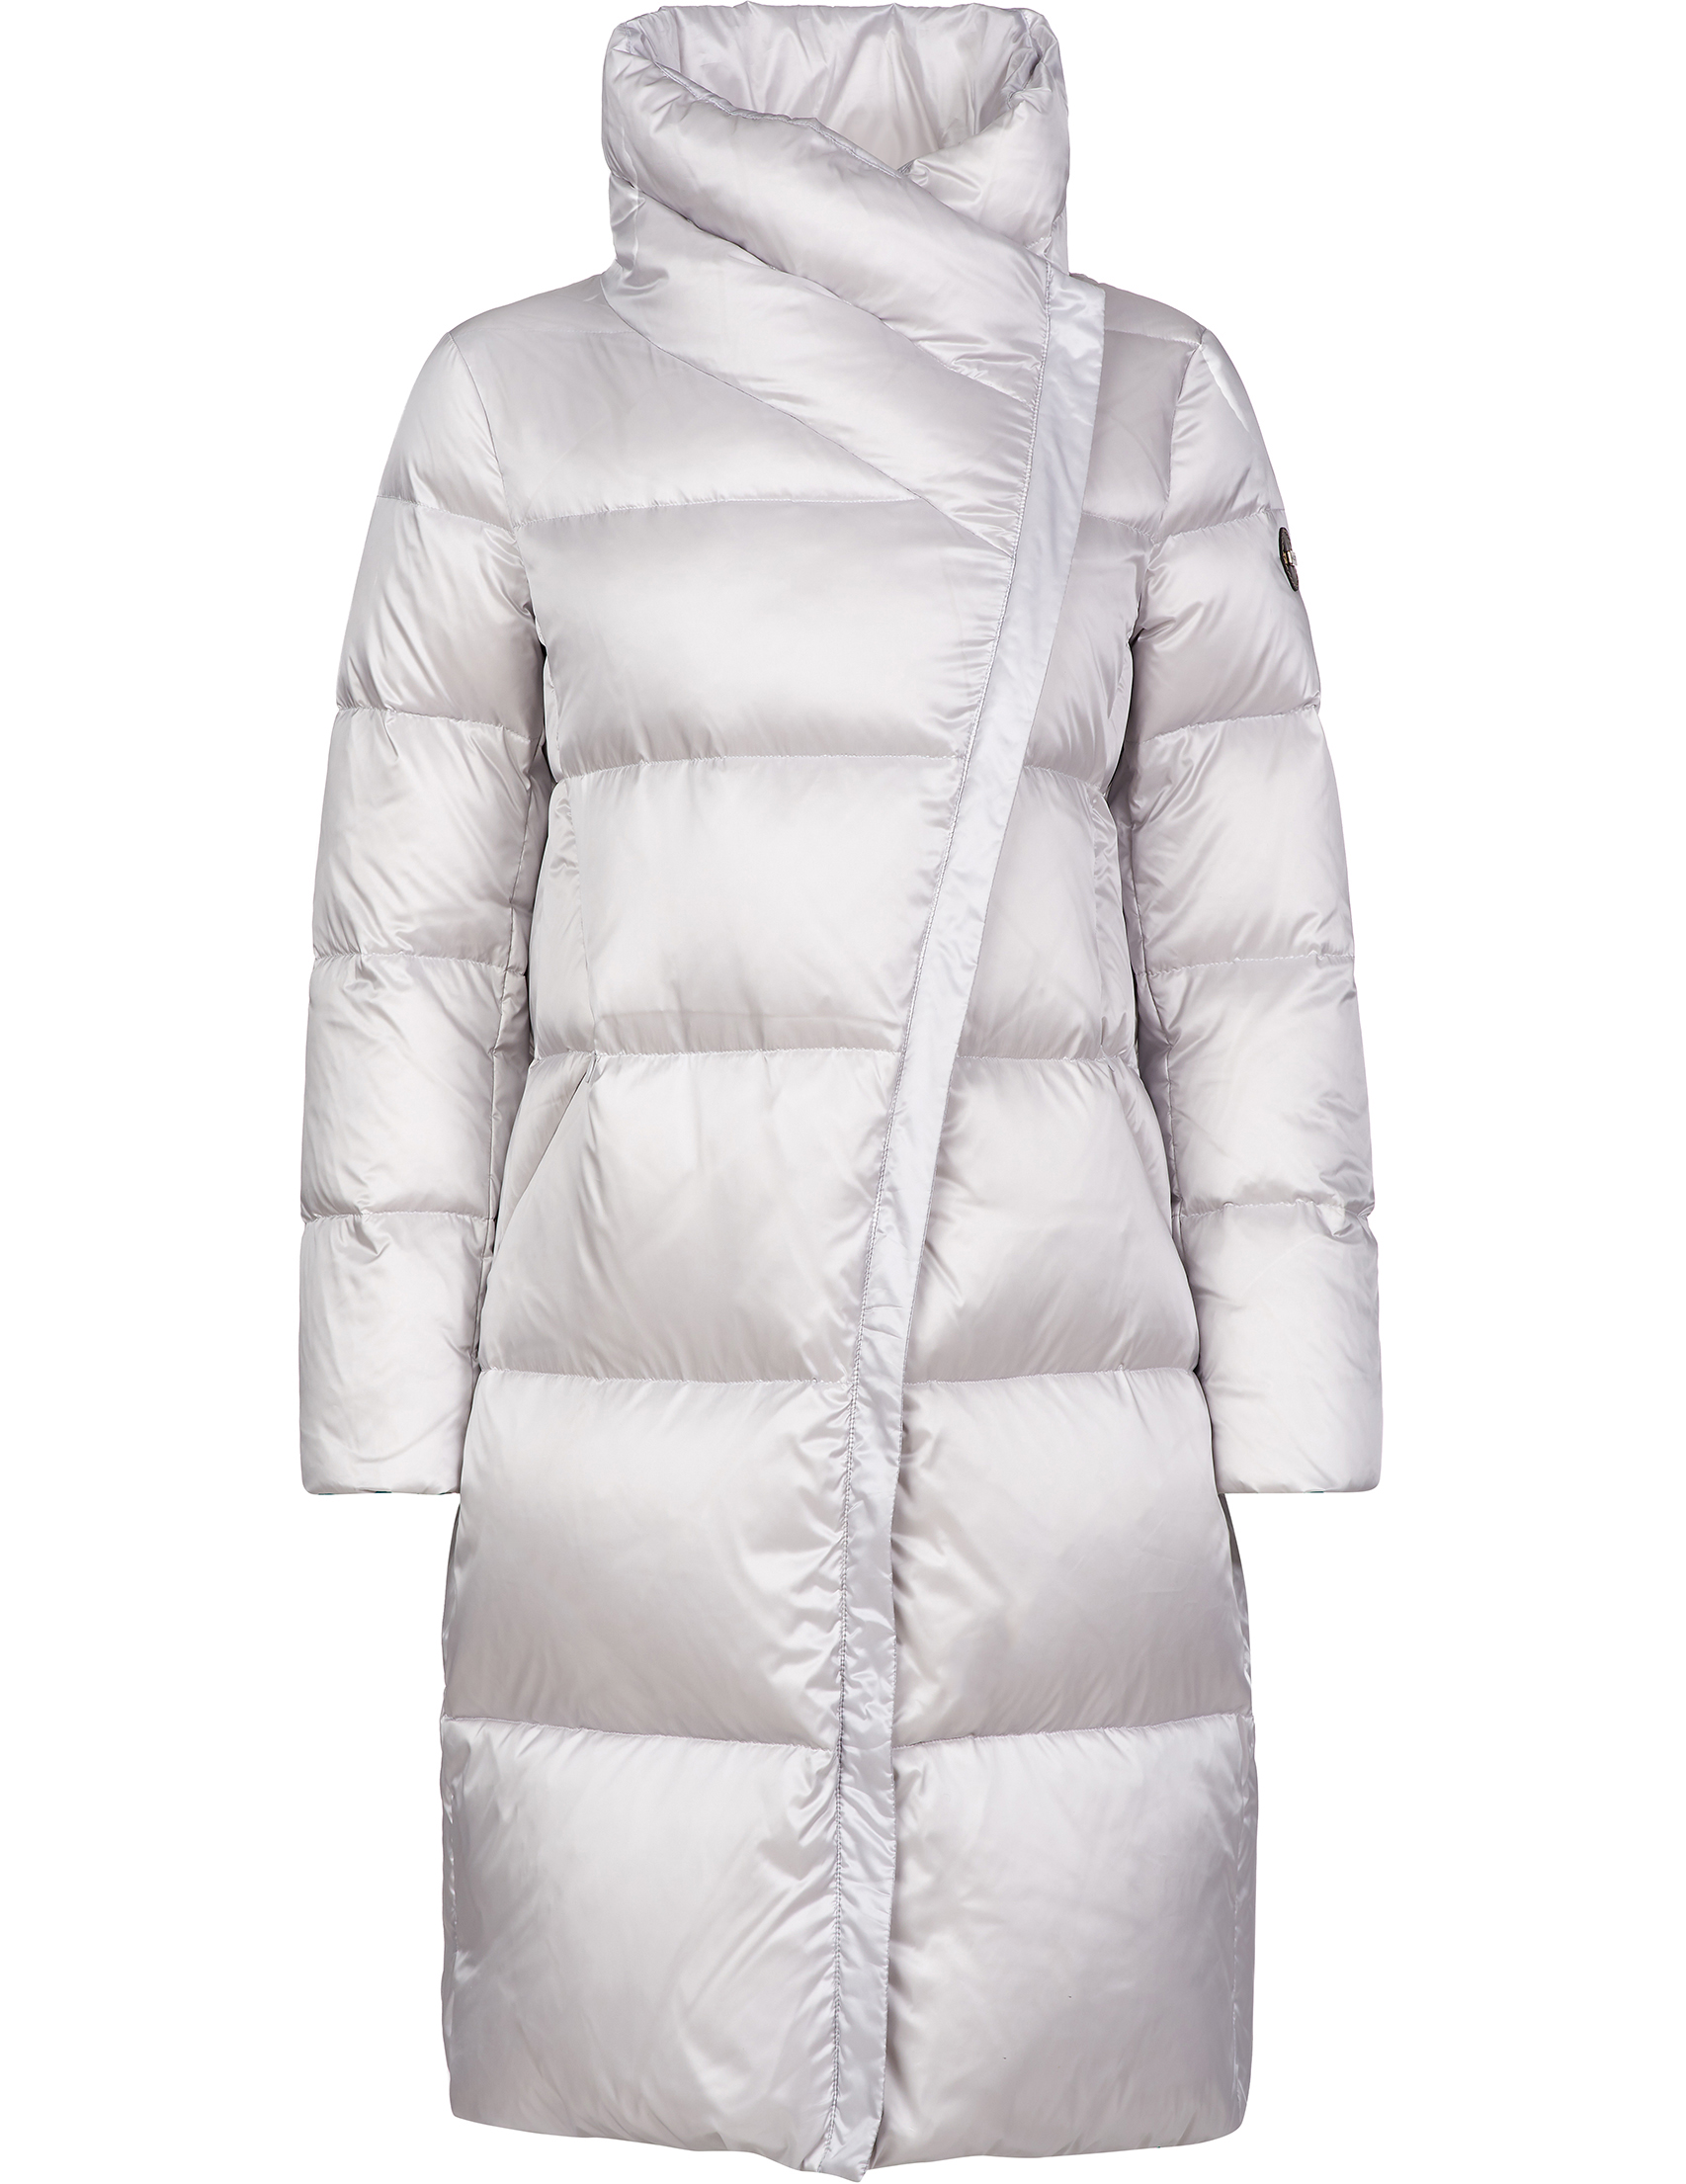 Купить Куртки, Куртка, GALLOTTI, Серый, 55%Полиэстер 37%Полиамид 8%Полиуритан;100%Полиэстер, Осень-Зима